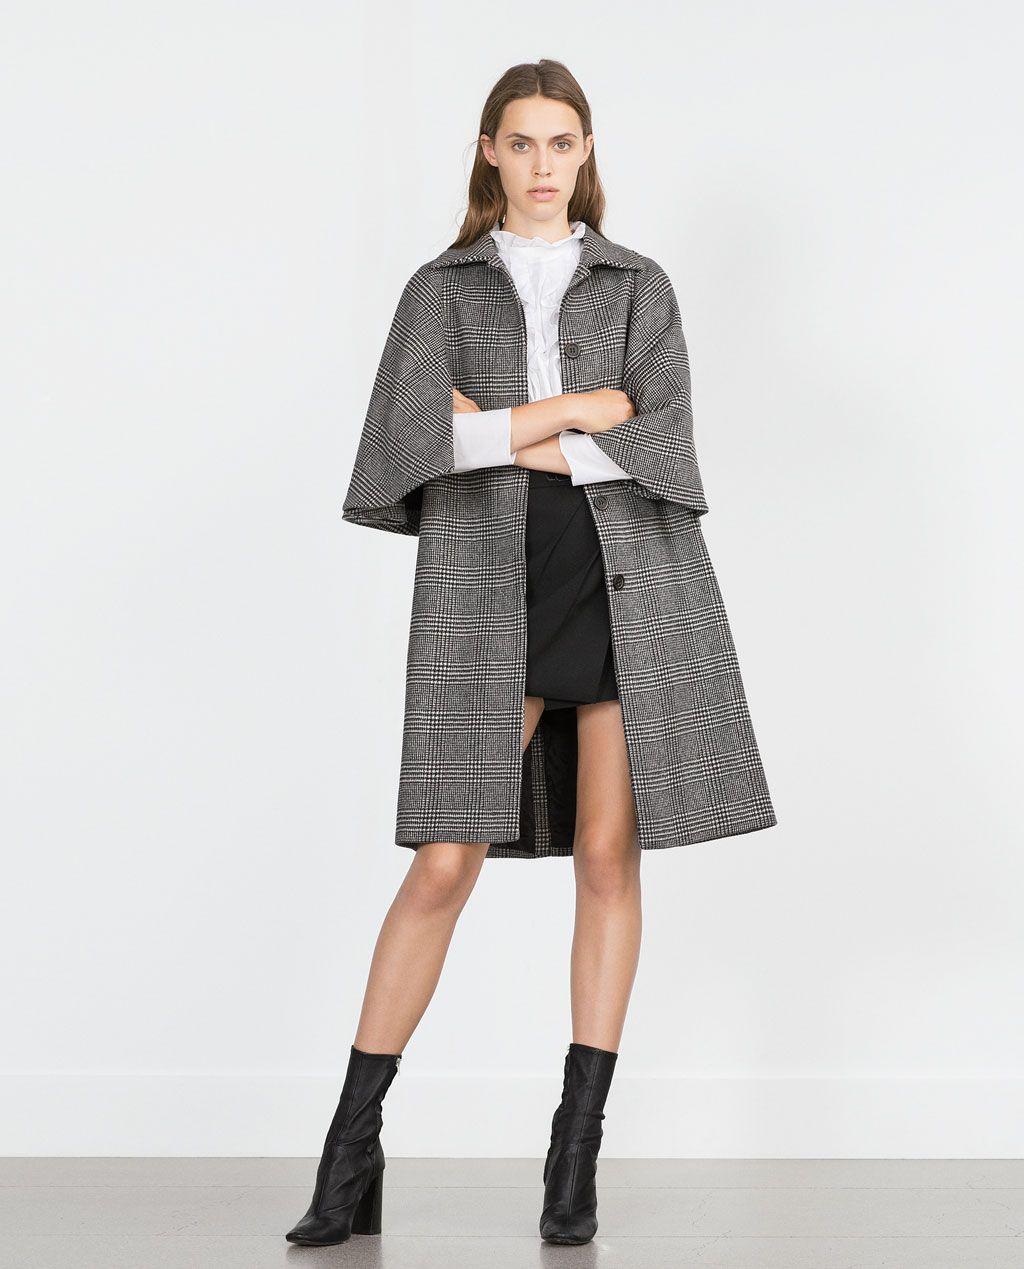 Lo Pinterest Zara Mujer Necesito Quiero Abrigo Cuadros 4ttfFq